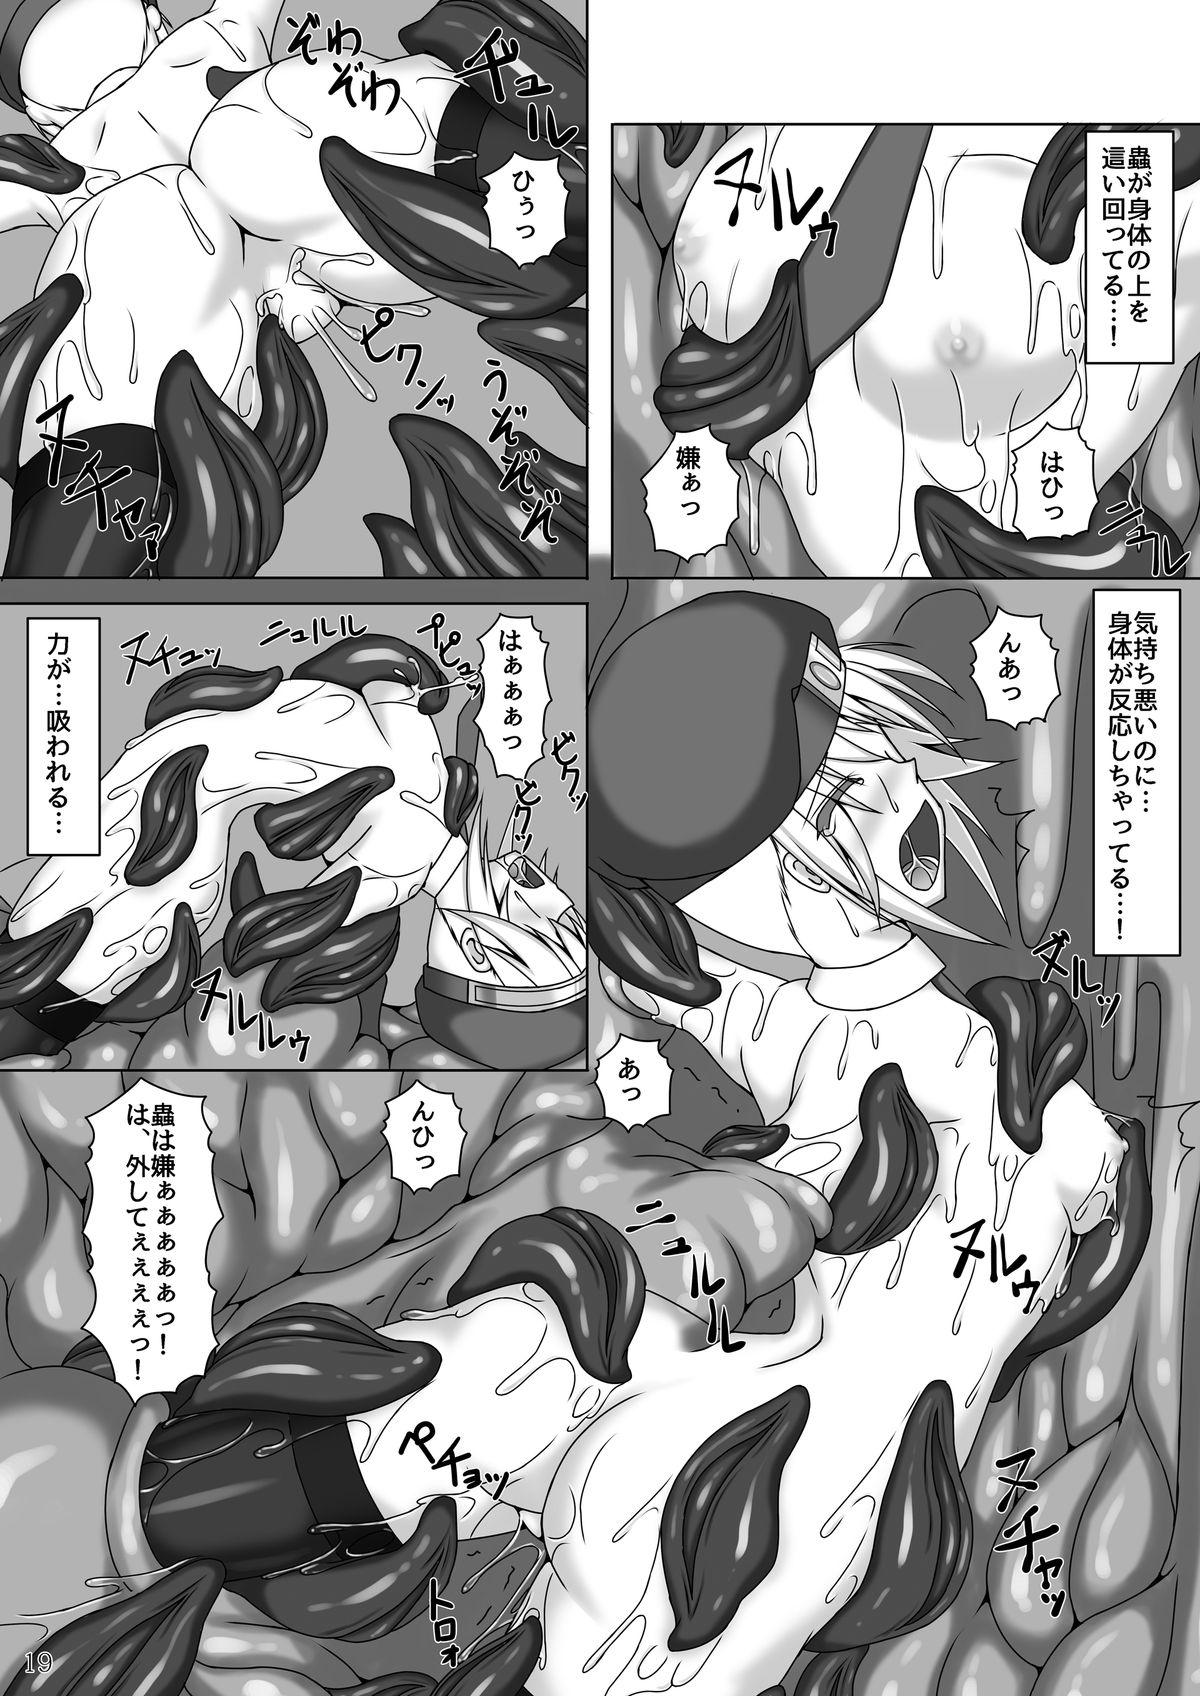 Arakune ga Kirai na Noel Nanka Imasen! 19